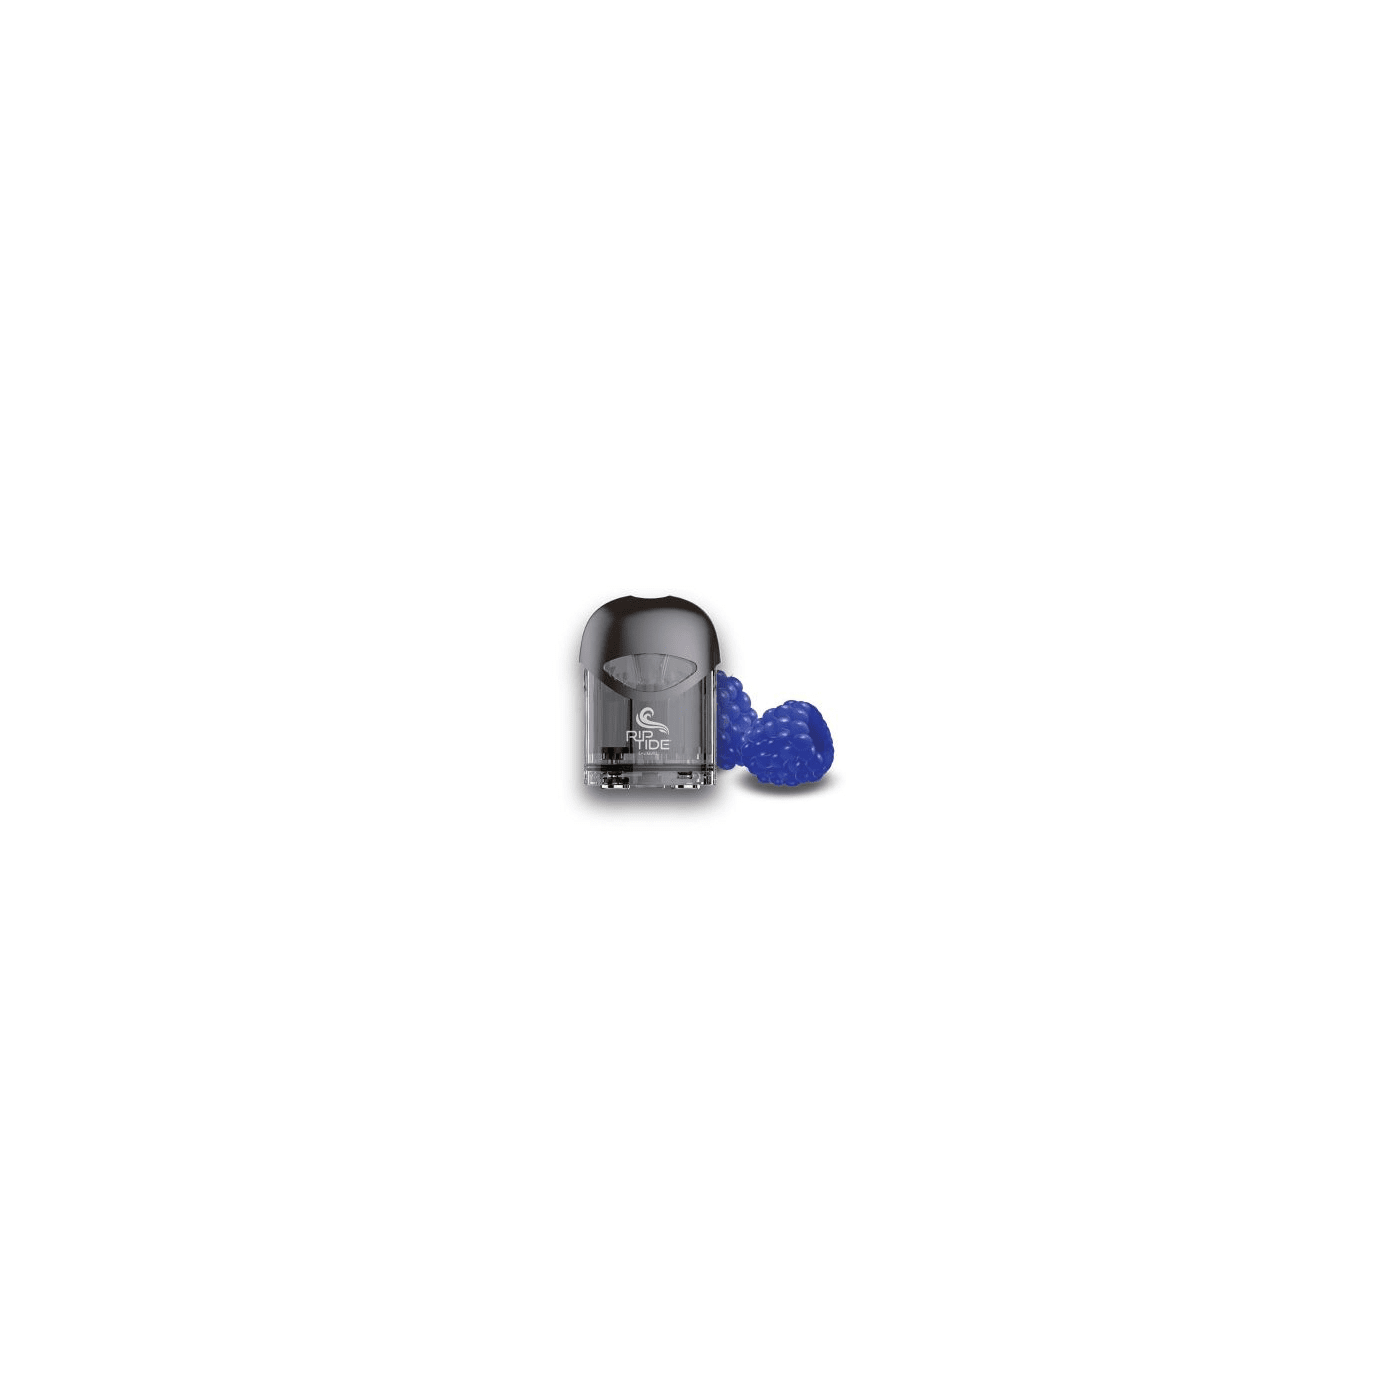 RipTide Disposable POD Blue Rasberry